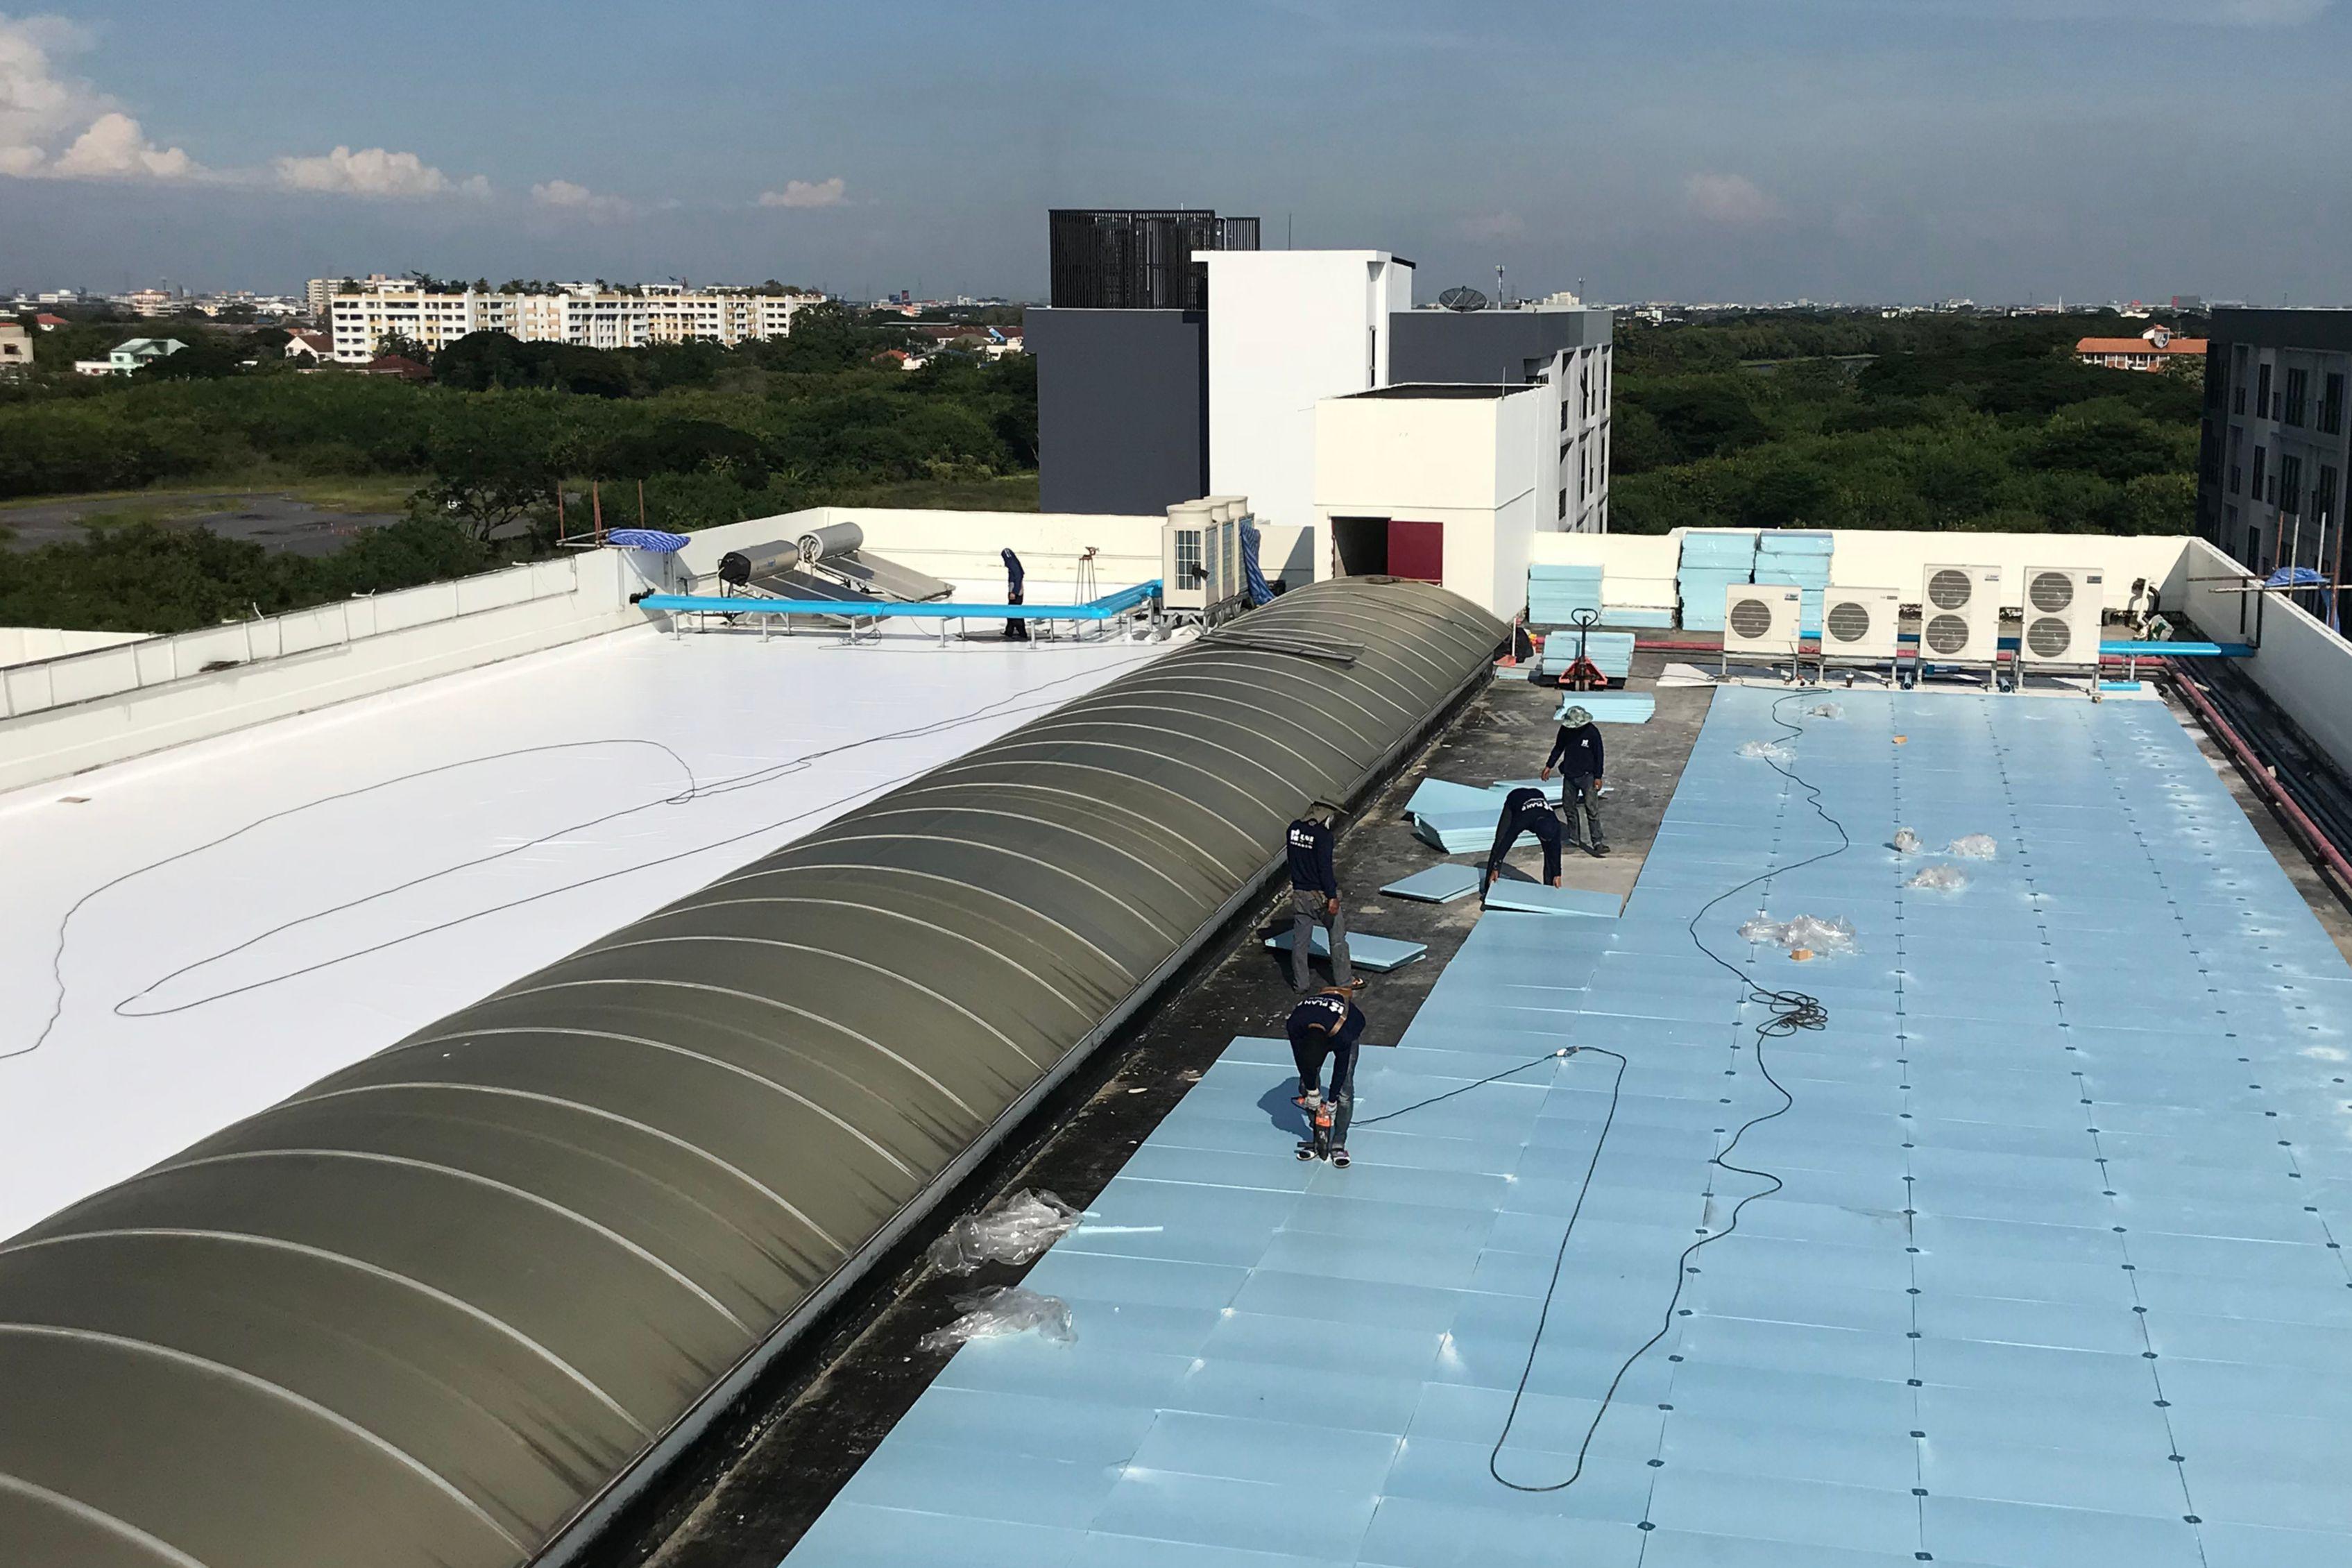 Dusit Thani College Refurbishment with Sarnafil Roof